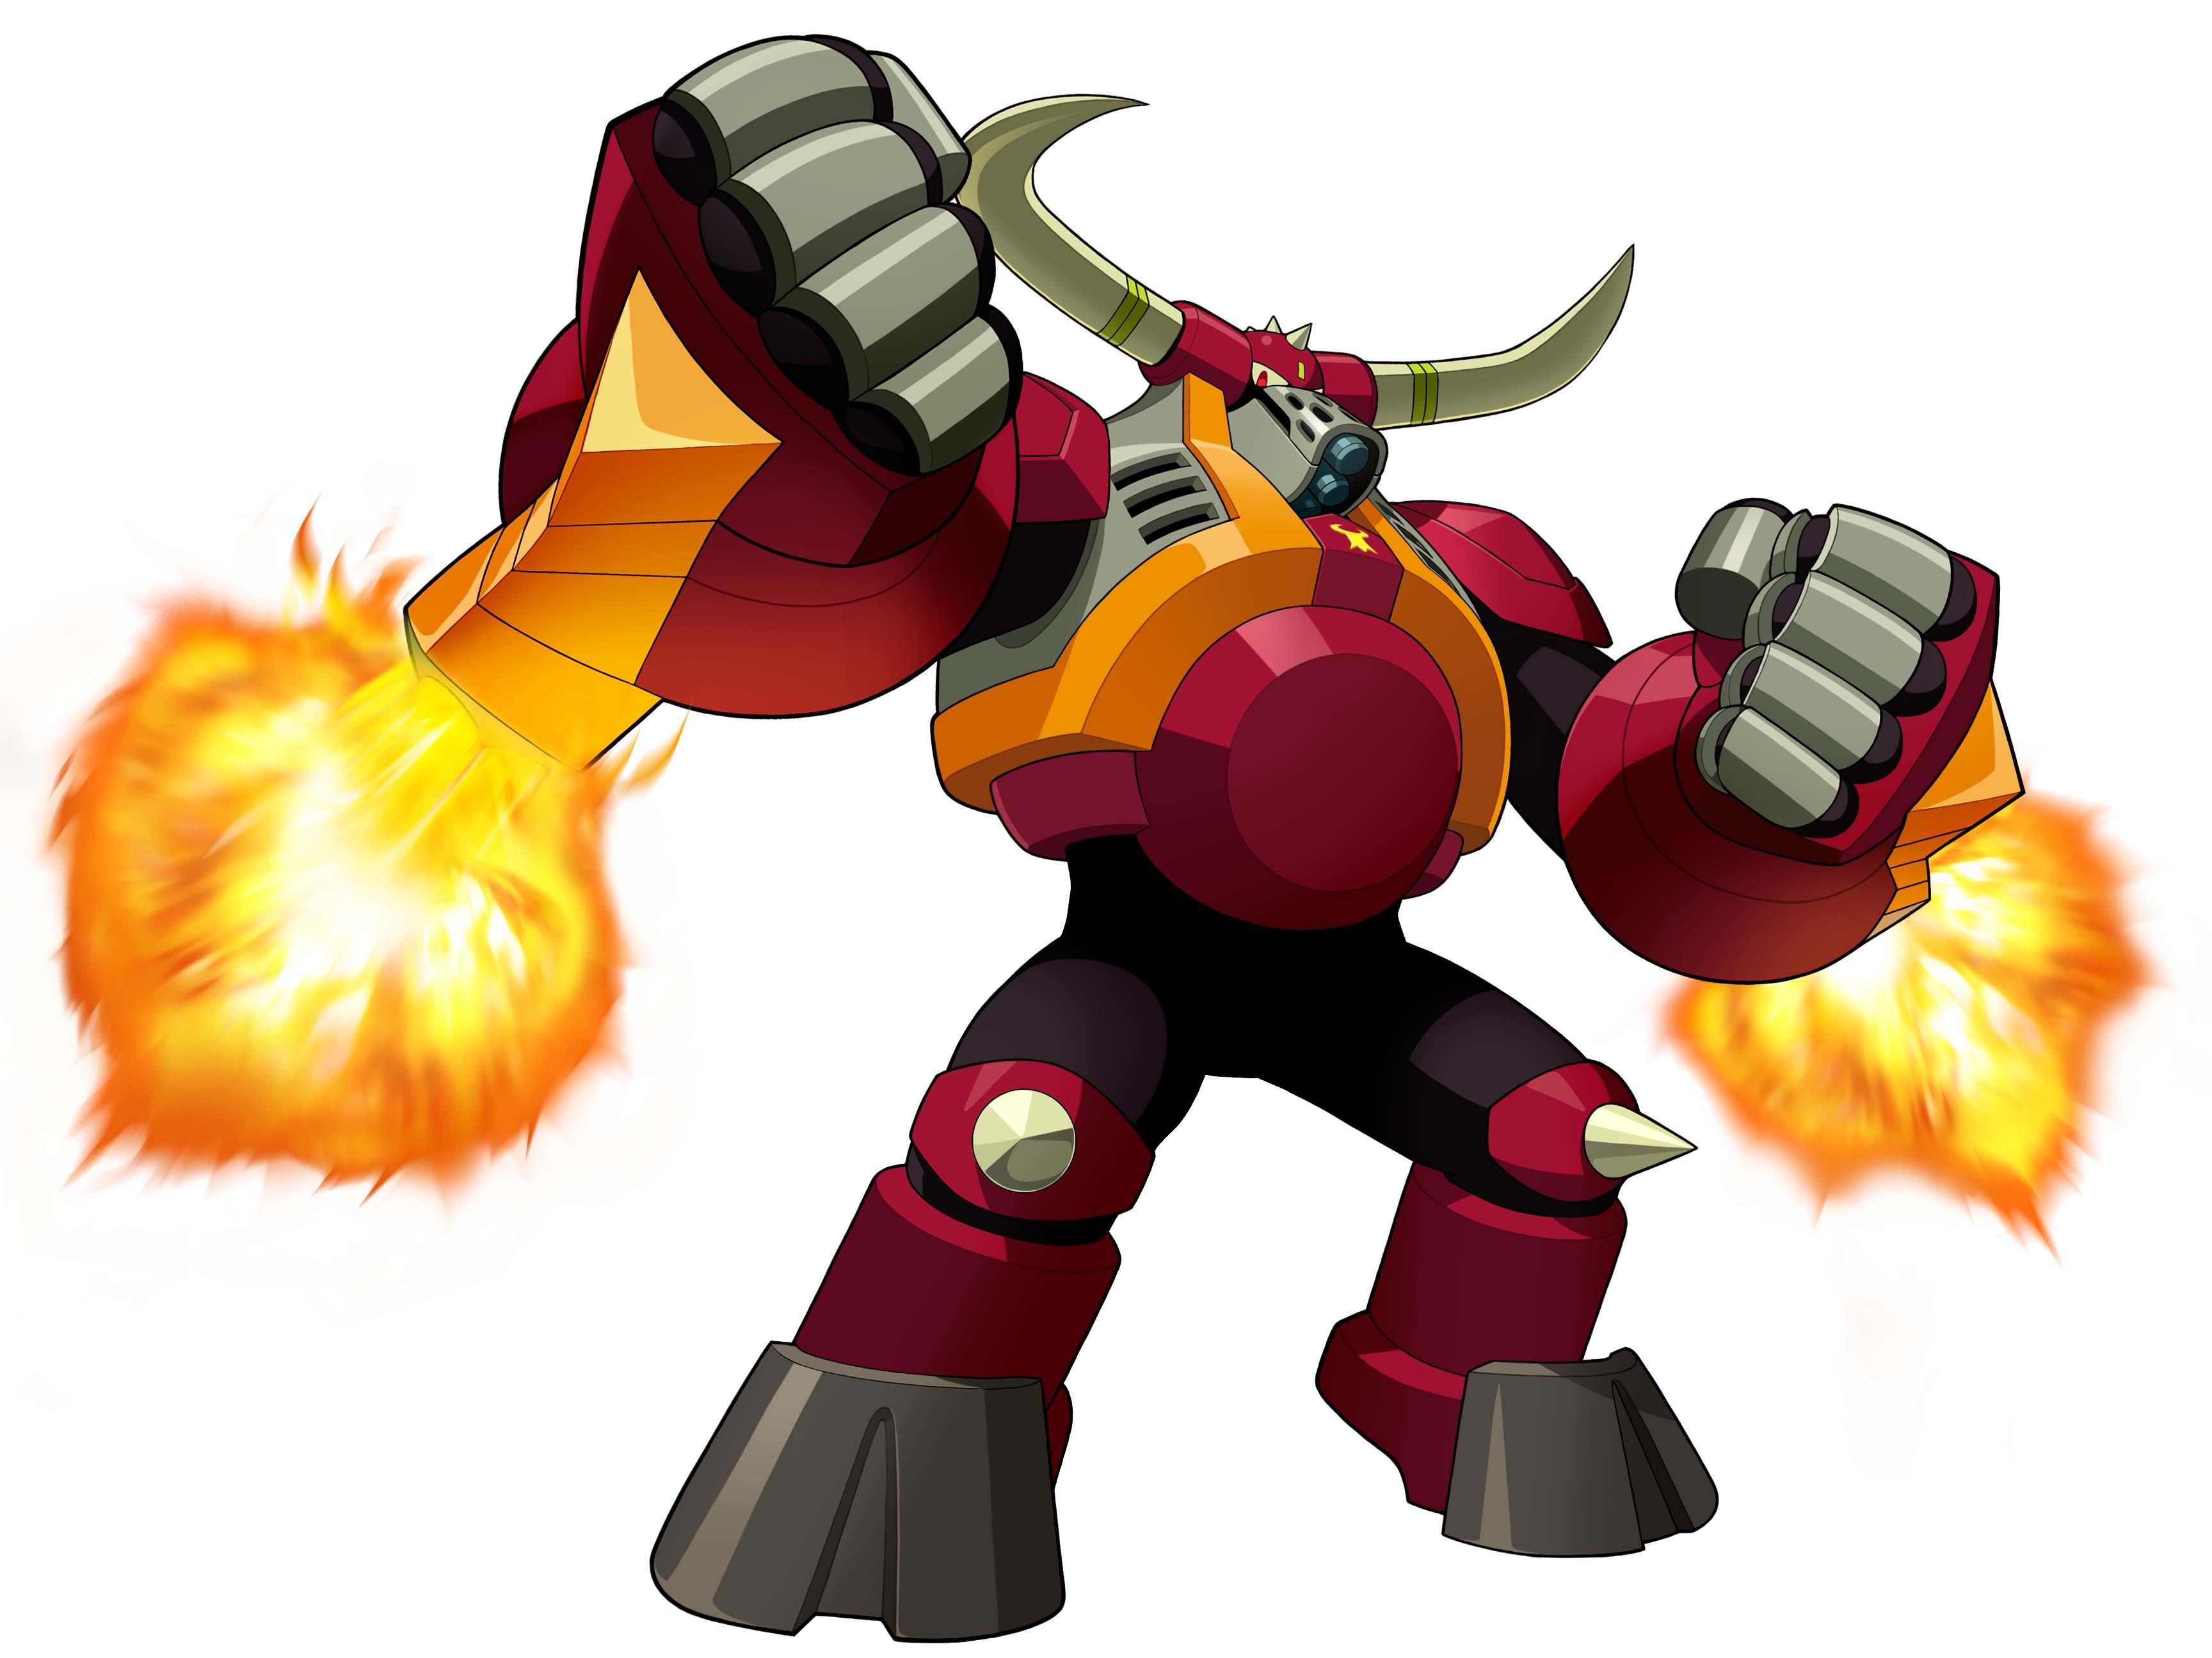 Taurus Fire Mmkb Fandom Powered By Wikia